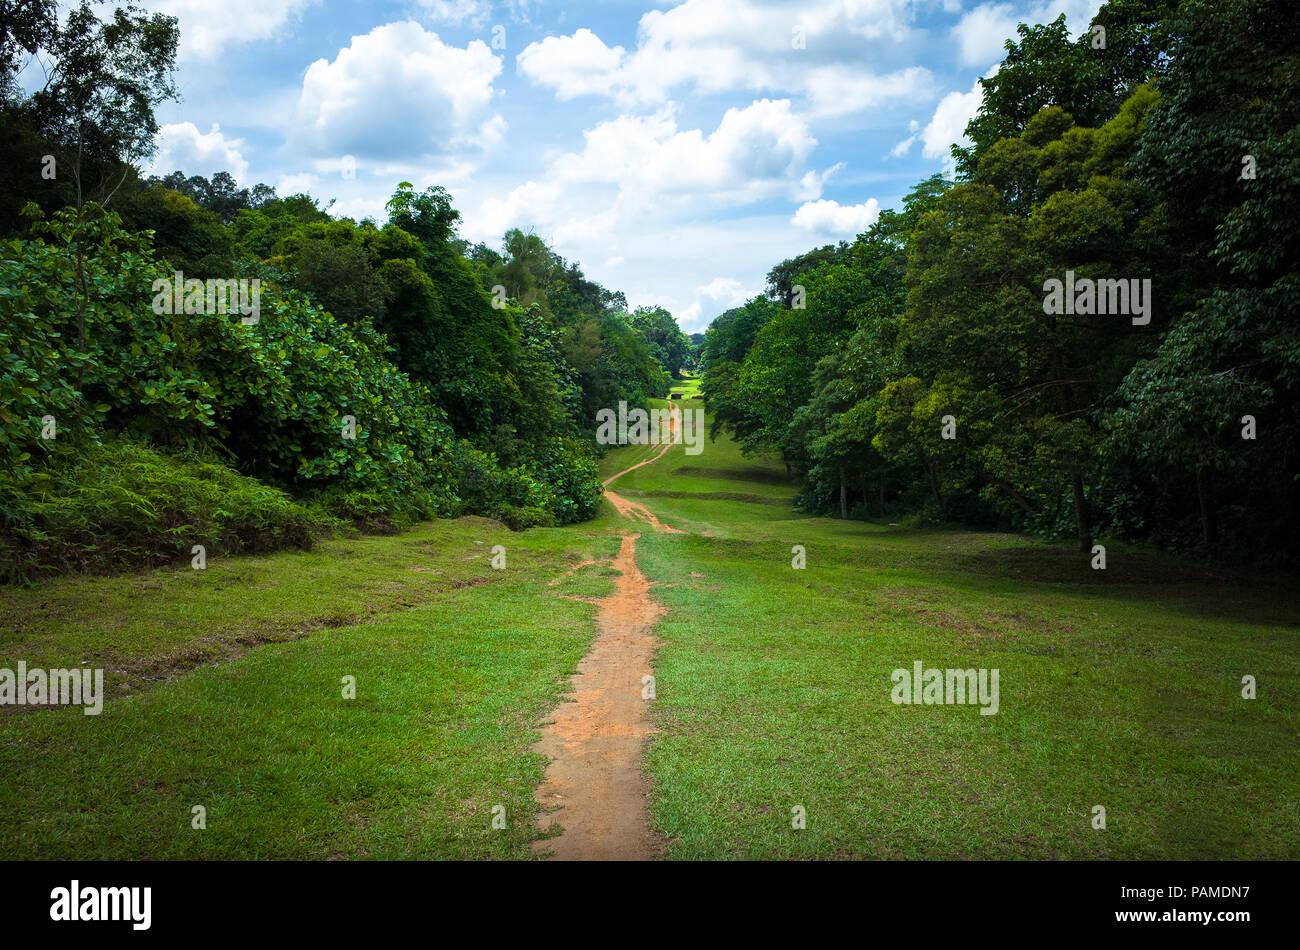 Dirt hiking & mountain biking trail in Bukit Timah Nature Park, leading to Macritchie Reservoir - Stock Image